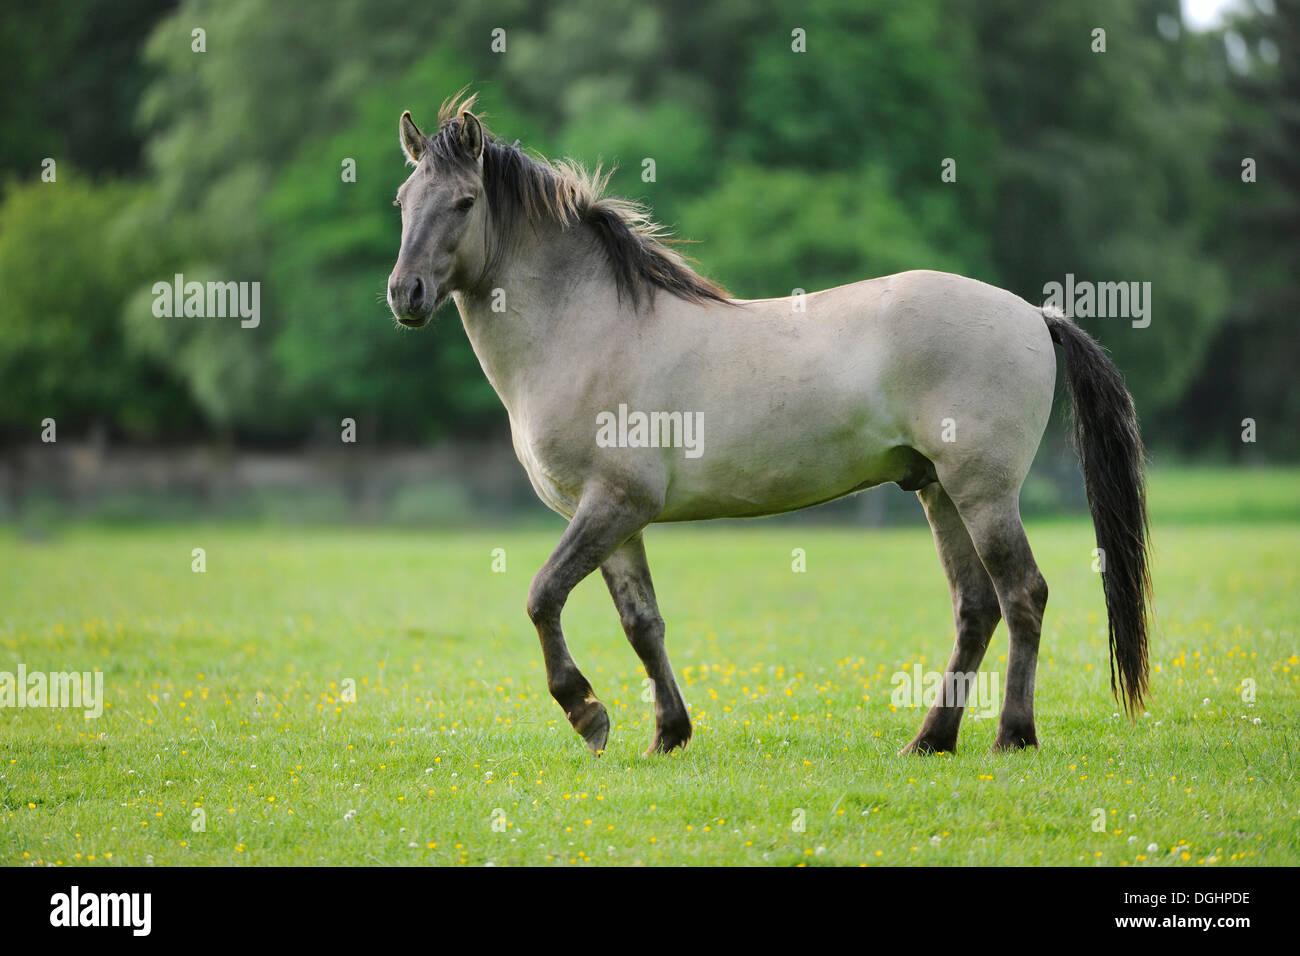 Tarpan (Equus ferus gmelini, Equus gmelini), selective breeding, breeding back, municipal game reserve, Hesse, Germany - Stock Image